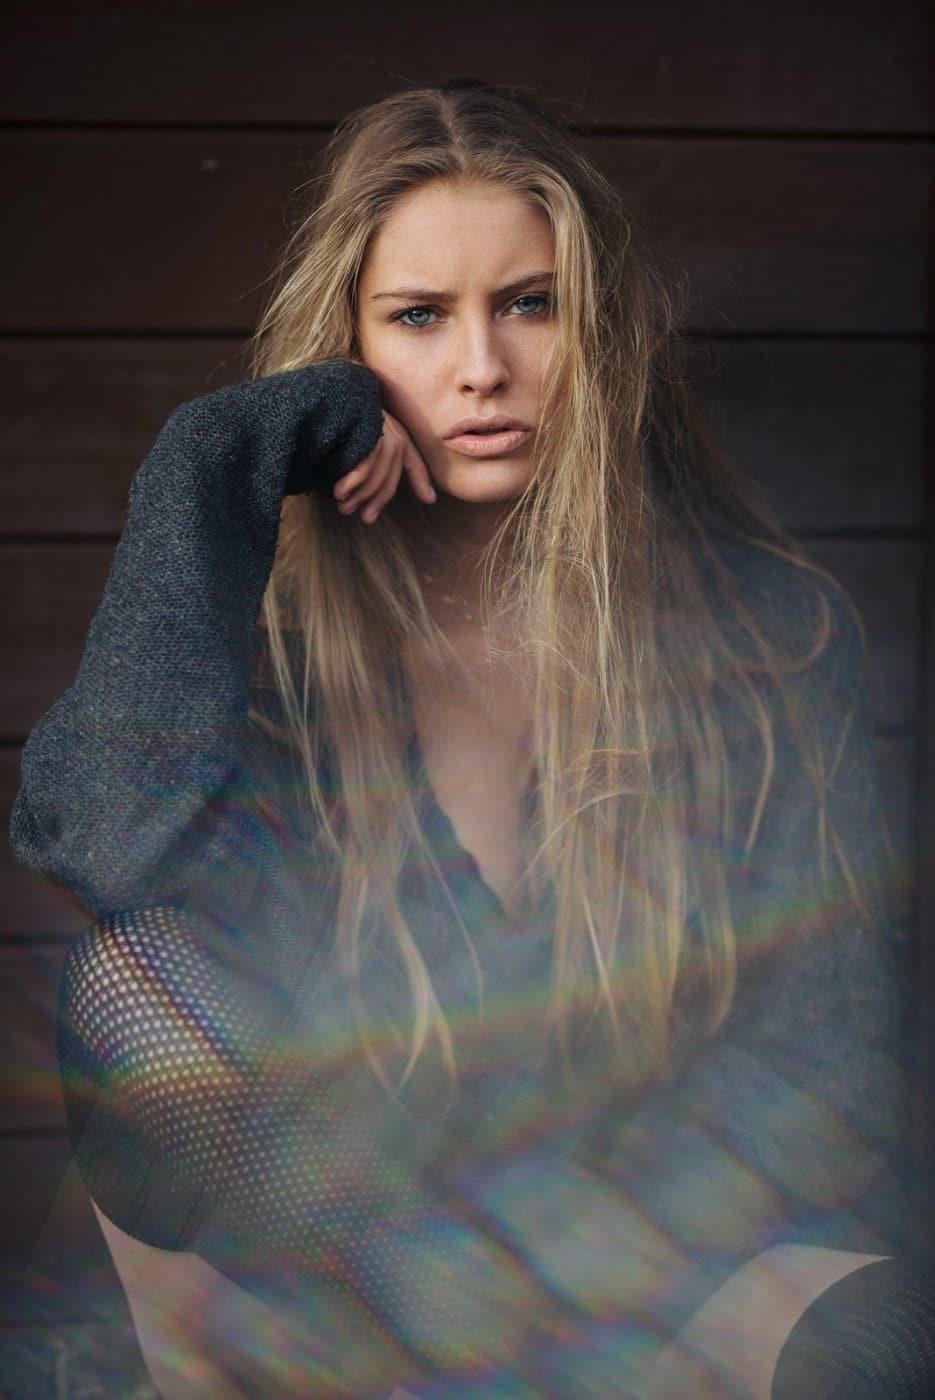 Portrait Photography By Anastasia Vervueren From Camille Rochette Prisma Light